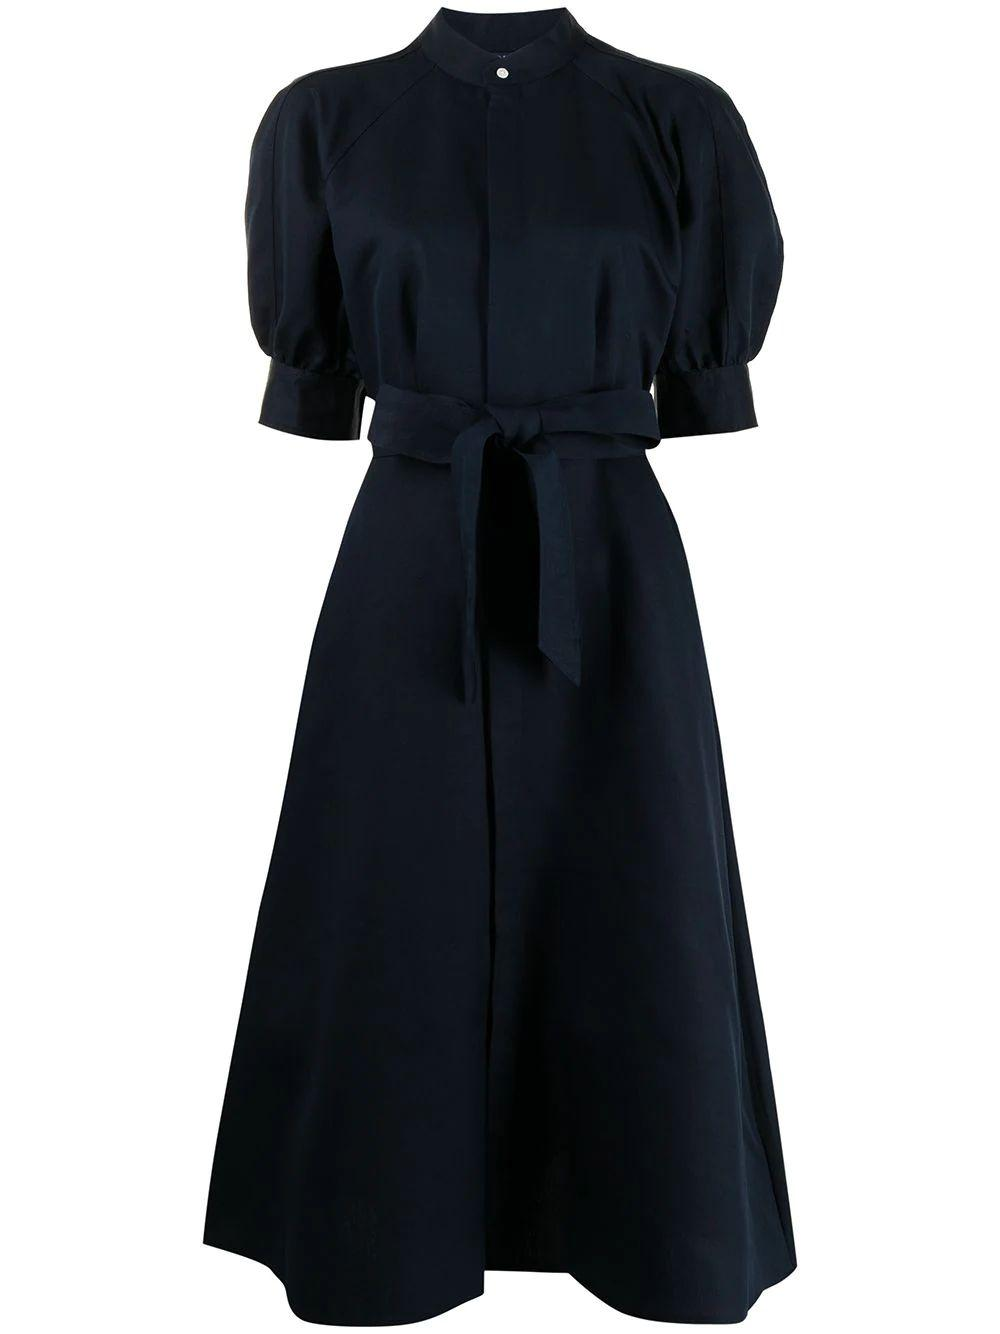 Cici Puff Sleeve Shirt Dress Item # 211827782001